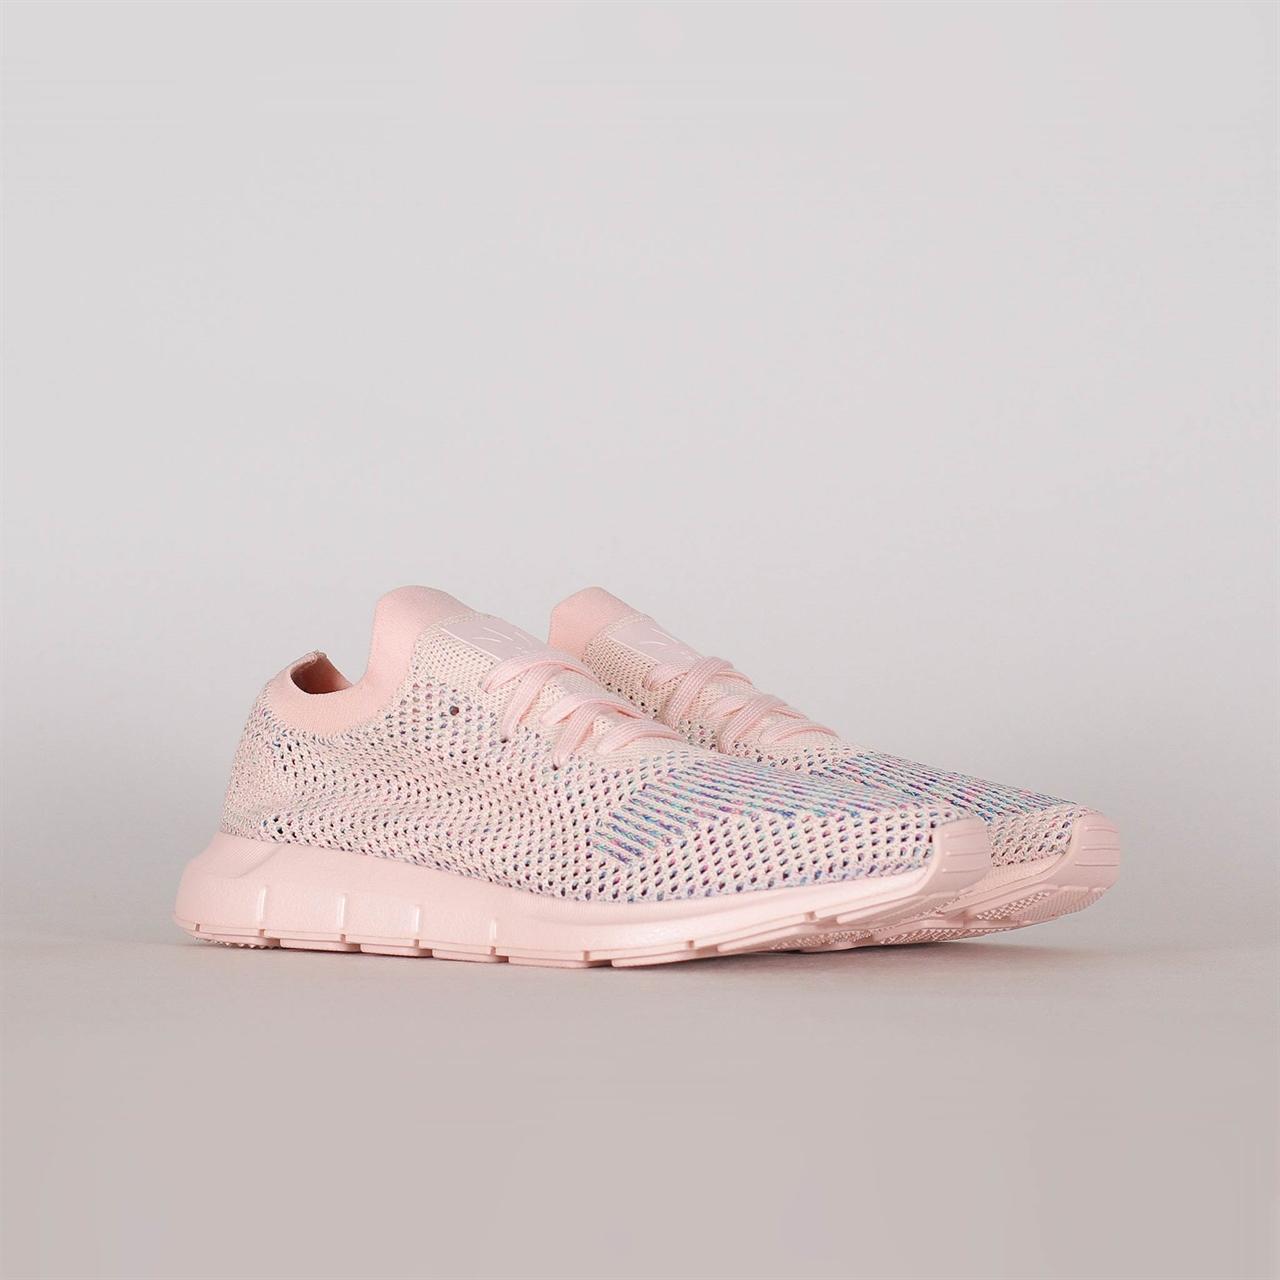 dfe6a28ce0624 Shelta - Adidas Originals Womens Swift Run Primeknit (CG4134)